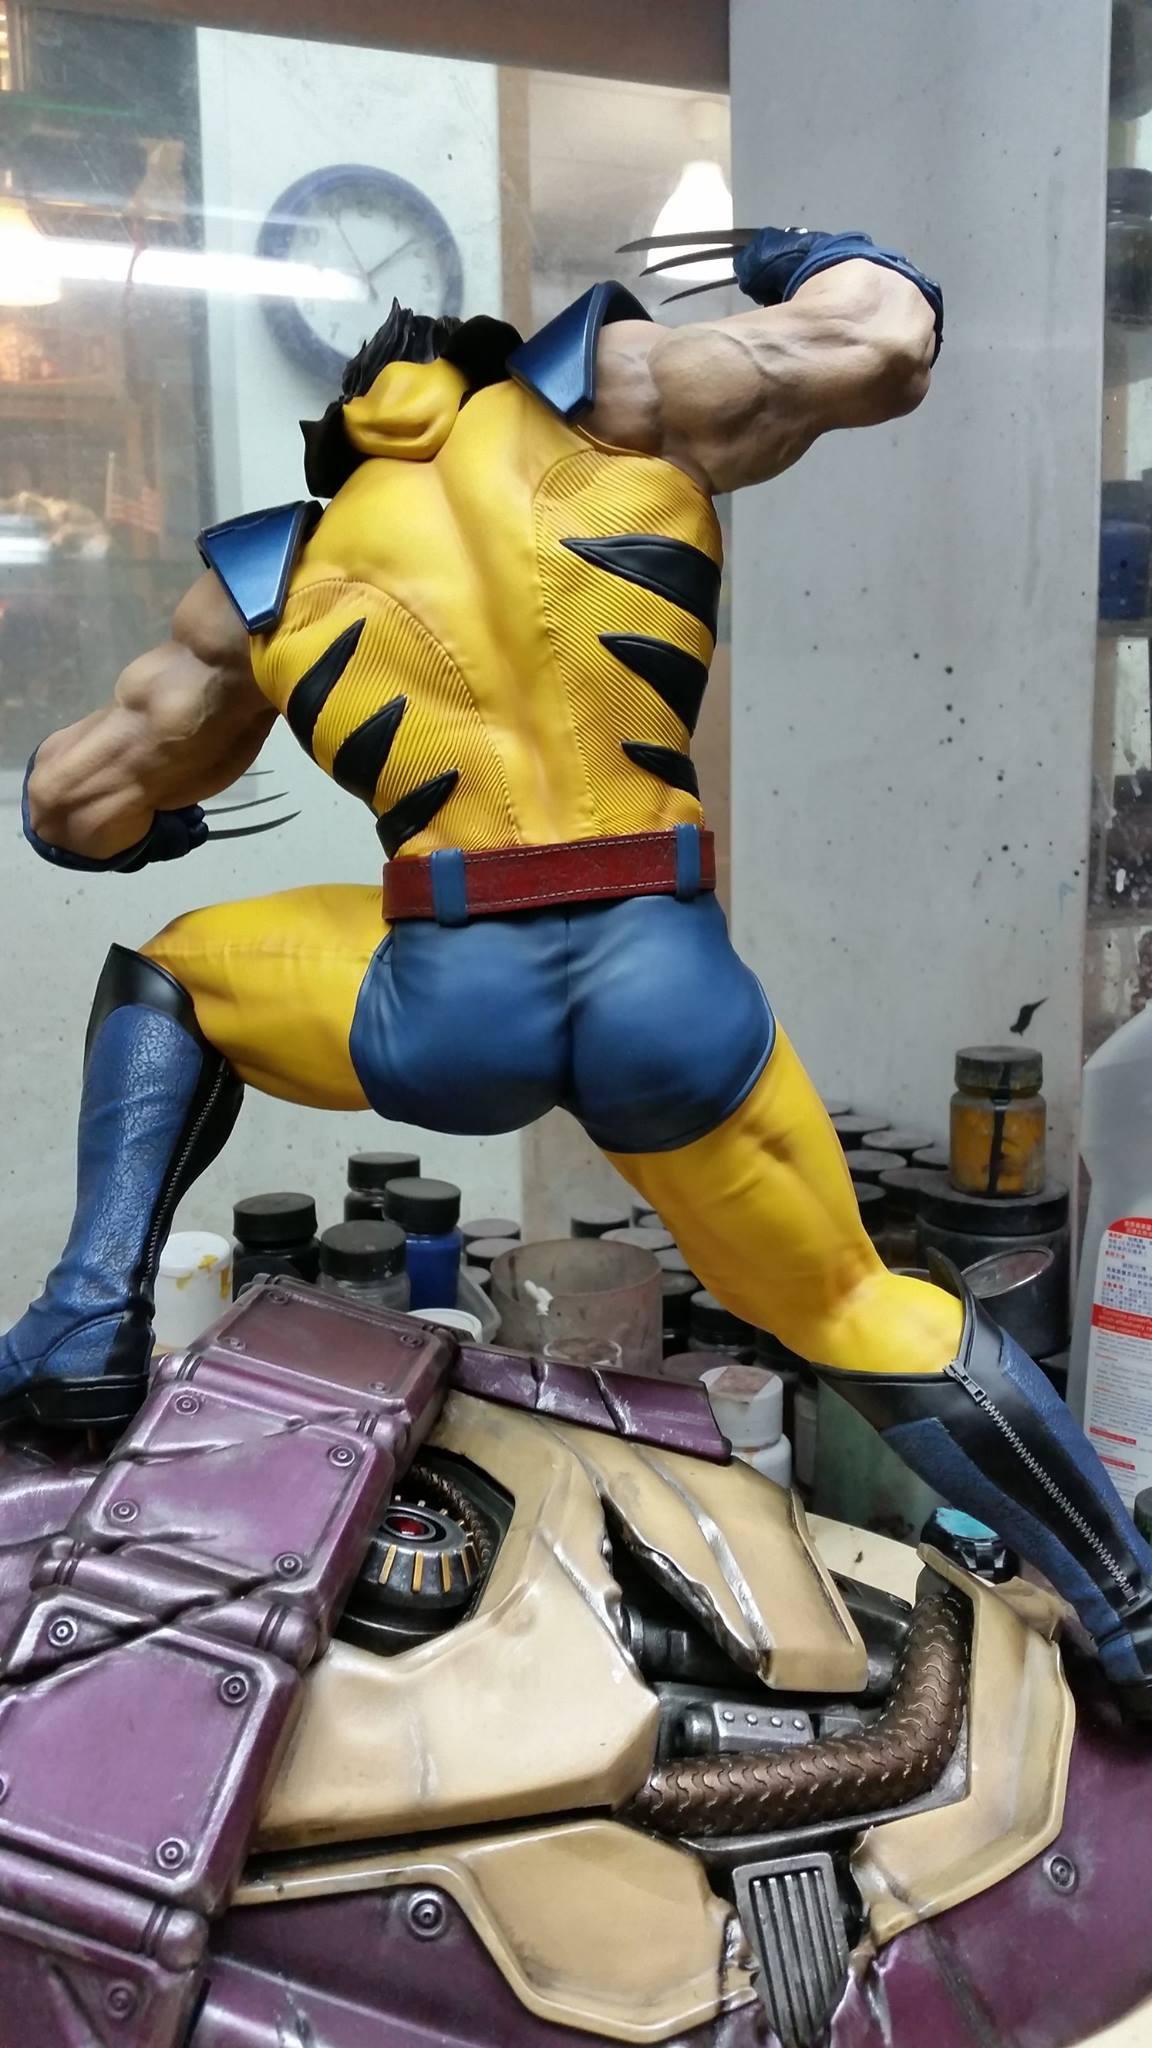 Premium Collectibles : Wolverine - Comics Version - Page 2 9397771049534514171091518431135564174044931532539o